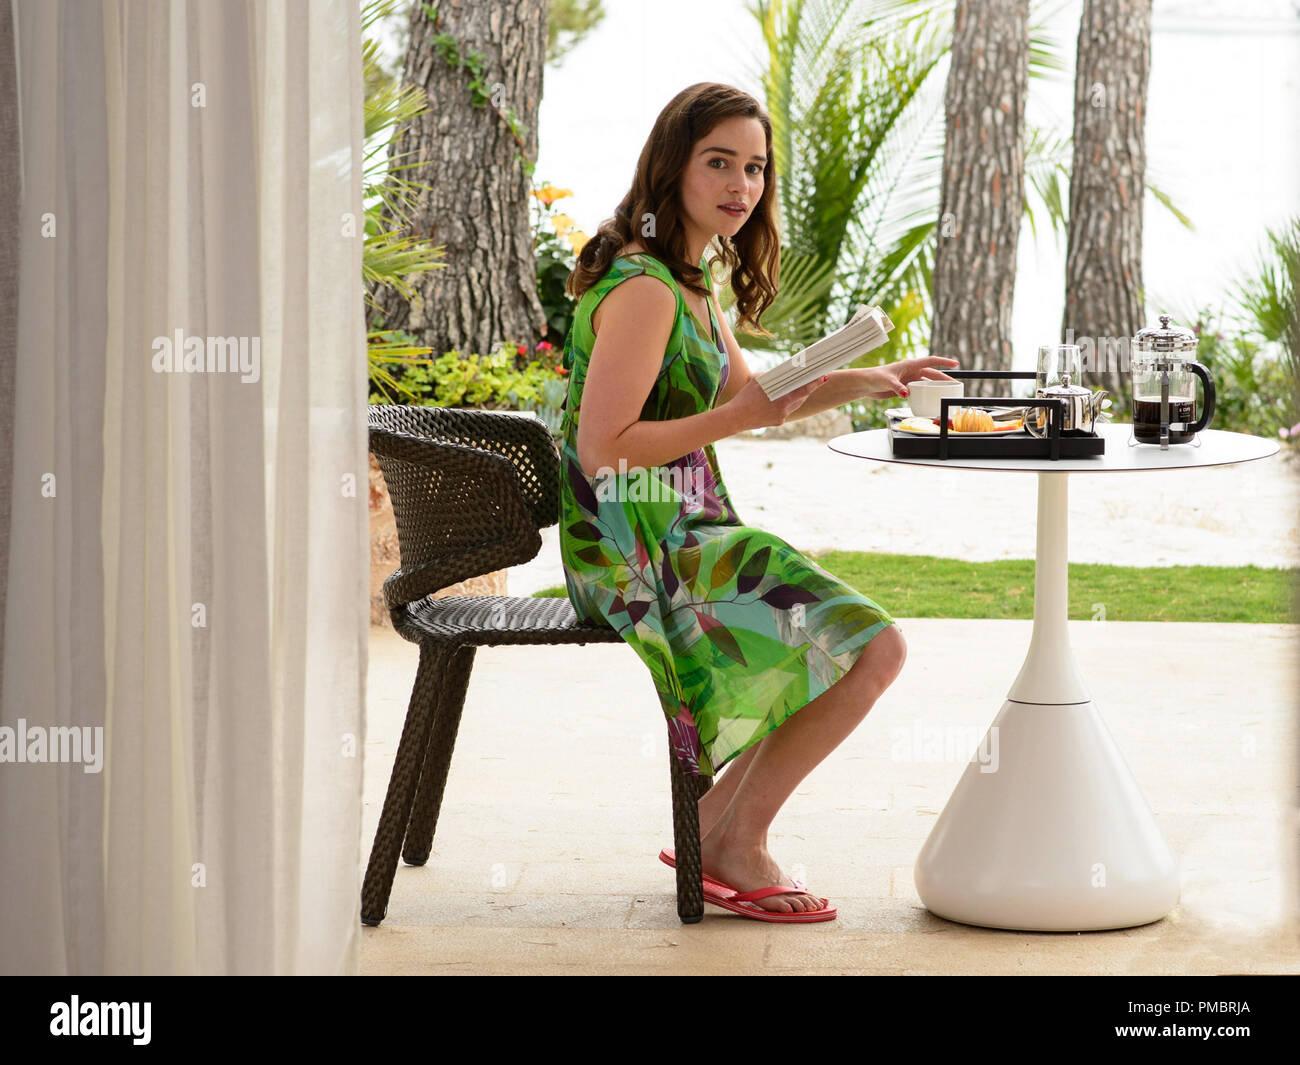 60b5a8f694a EMILIA CLARKE-Lou Clark in New Line Cinema s and Metro-Goldwyn-Mayer  Pictures  romantic drama